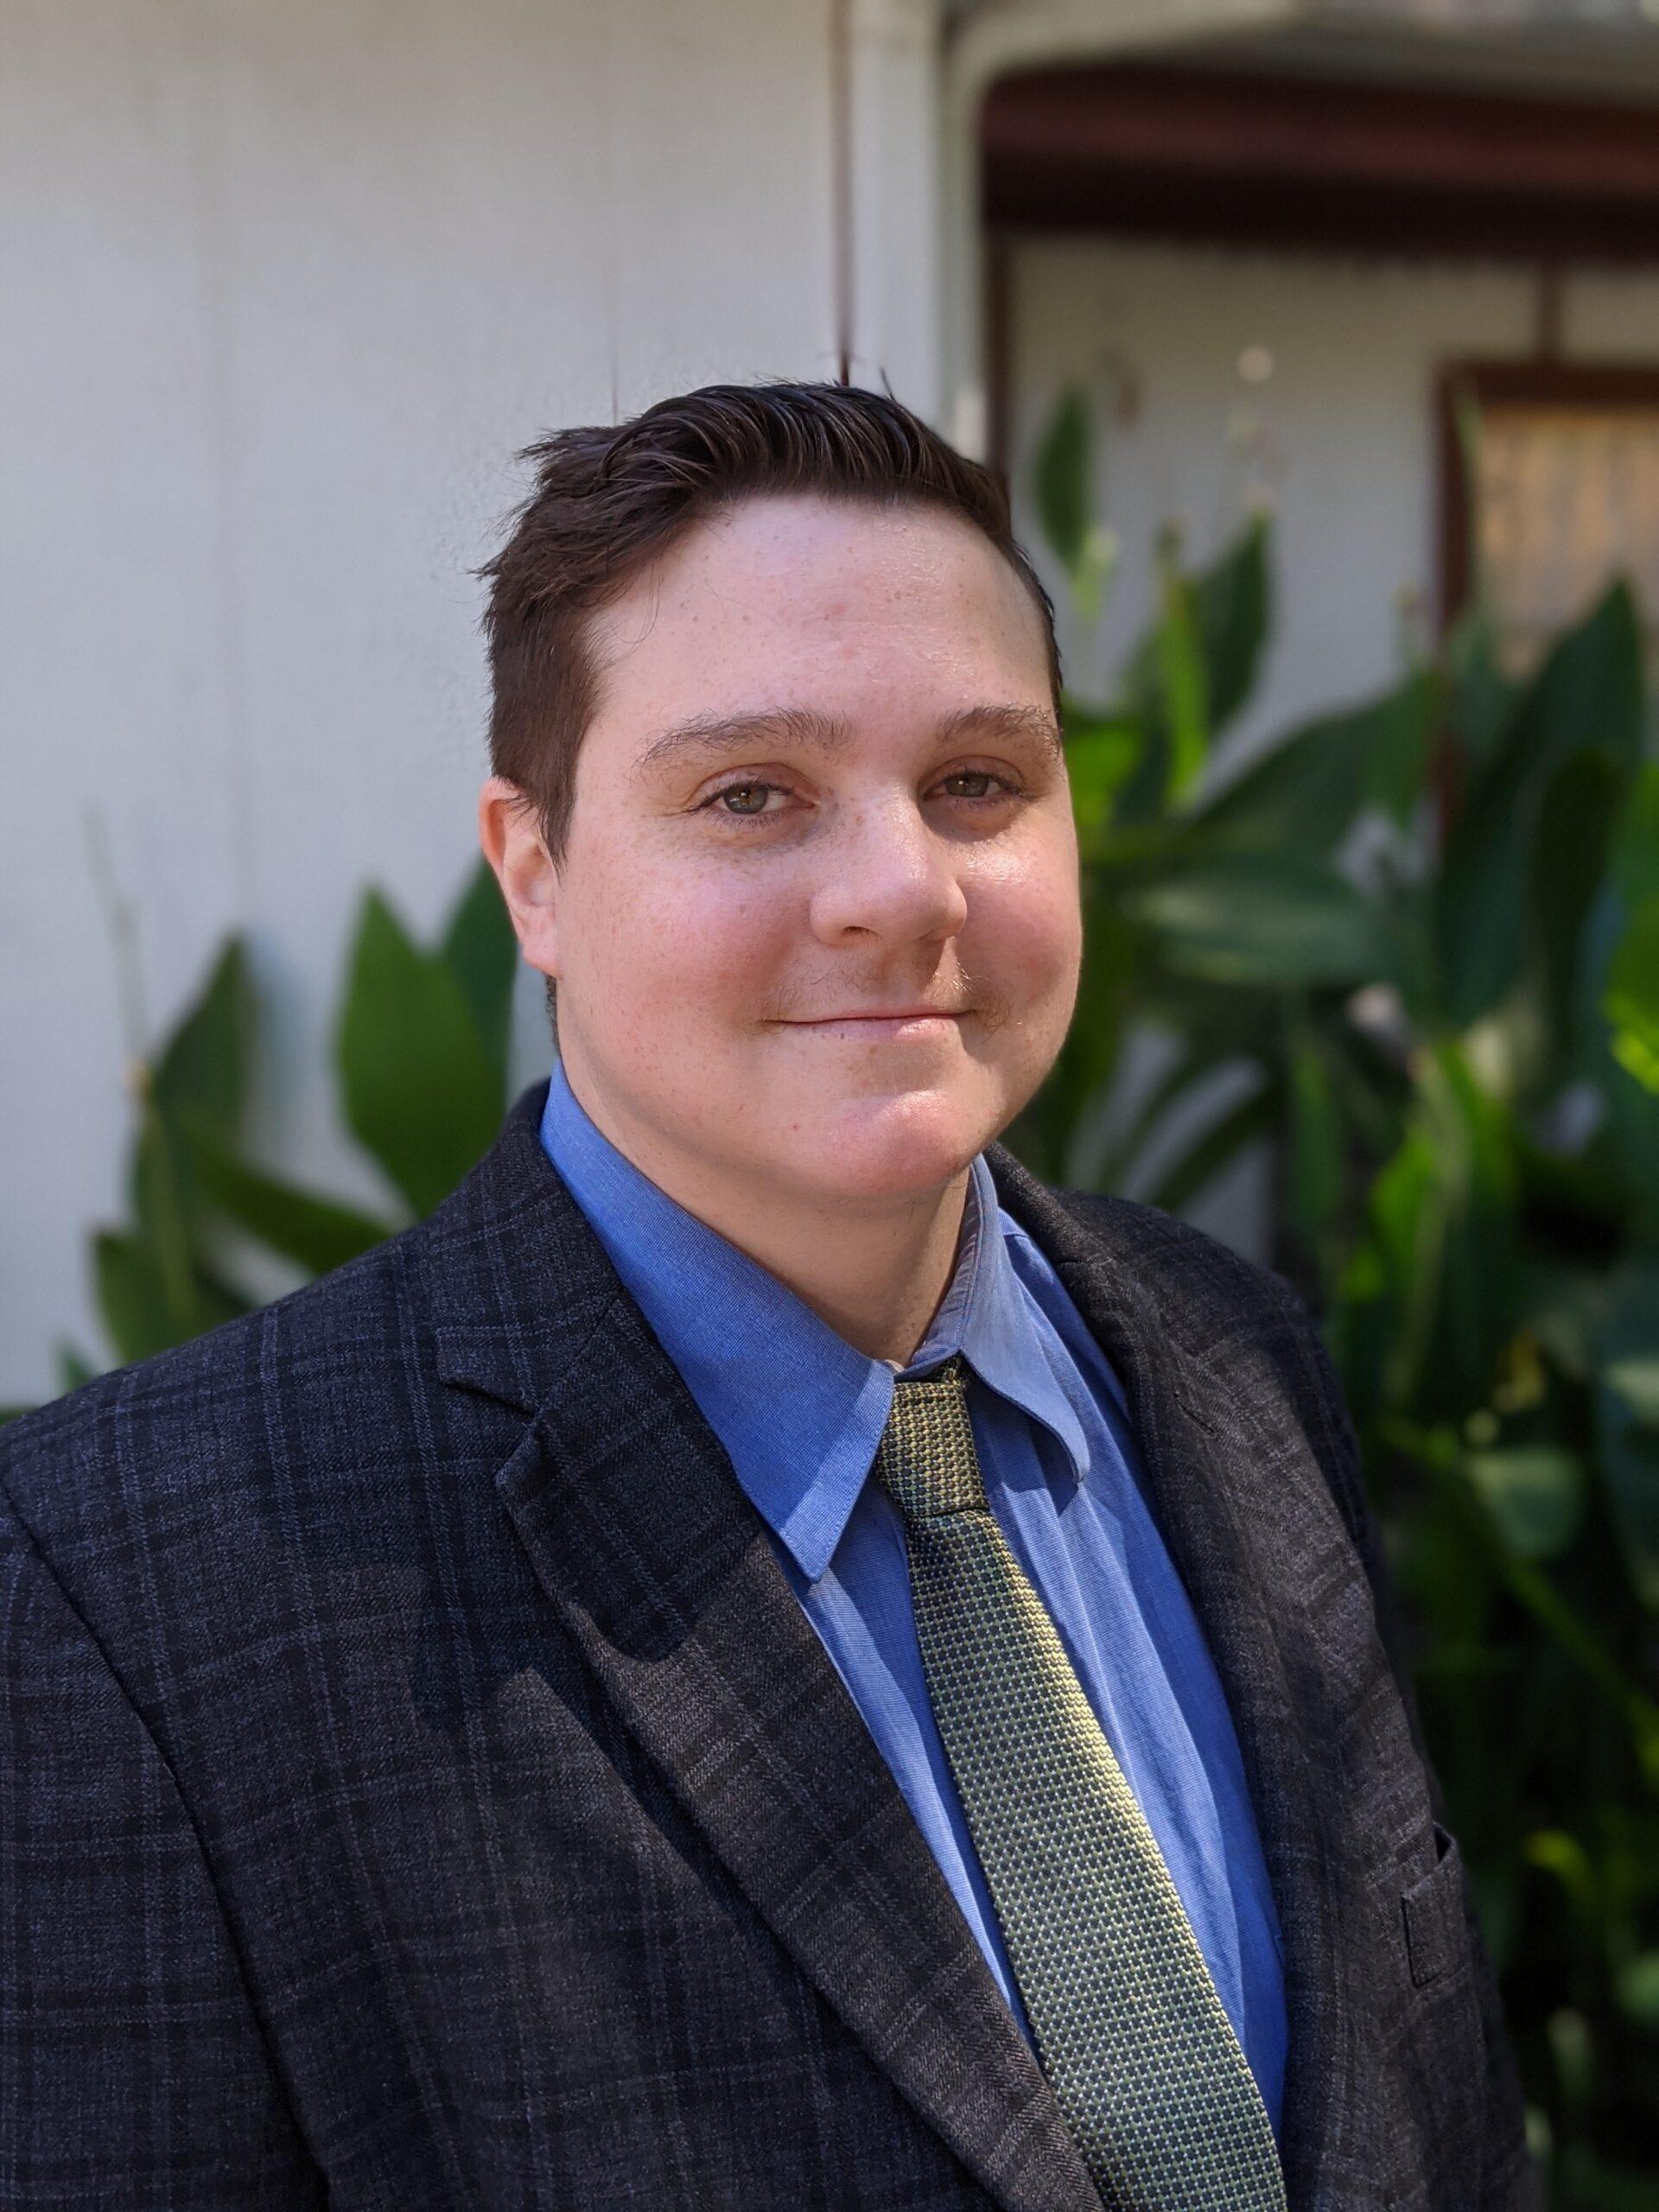 Morgan McAllister, Senior Content Writer at RedShift Writers